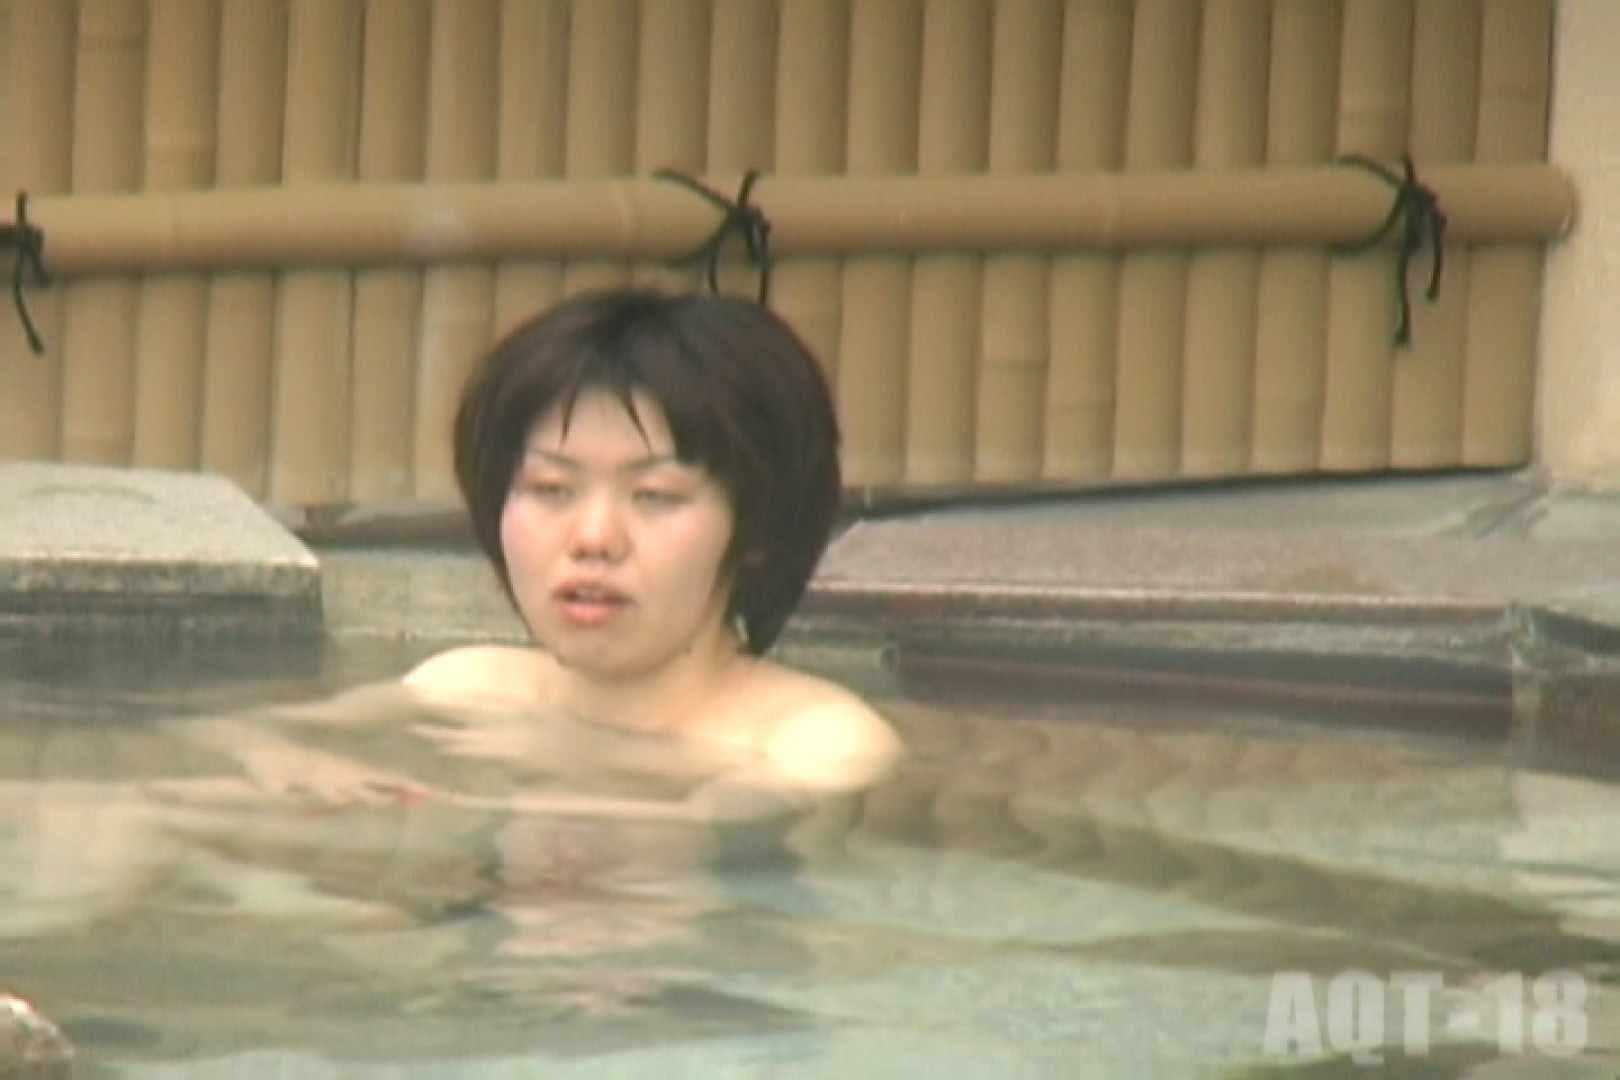 Aquaな露天風呂Vol.861 0  87連発 2